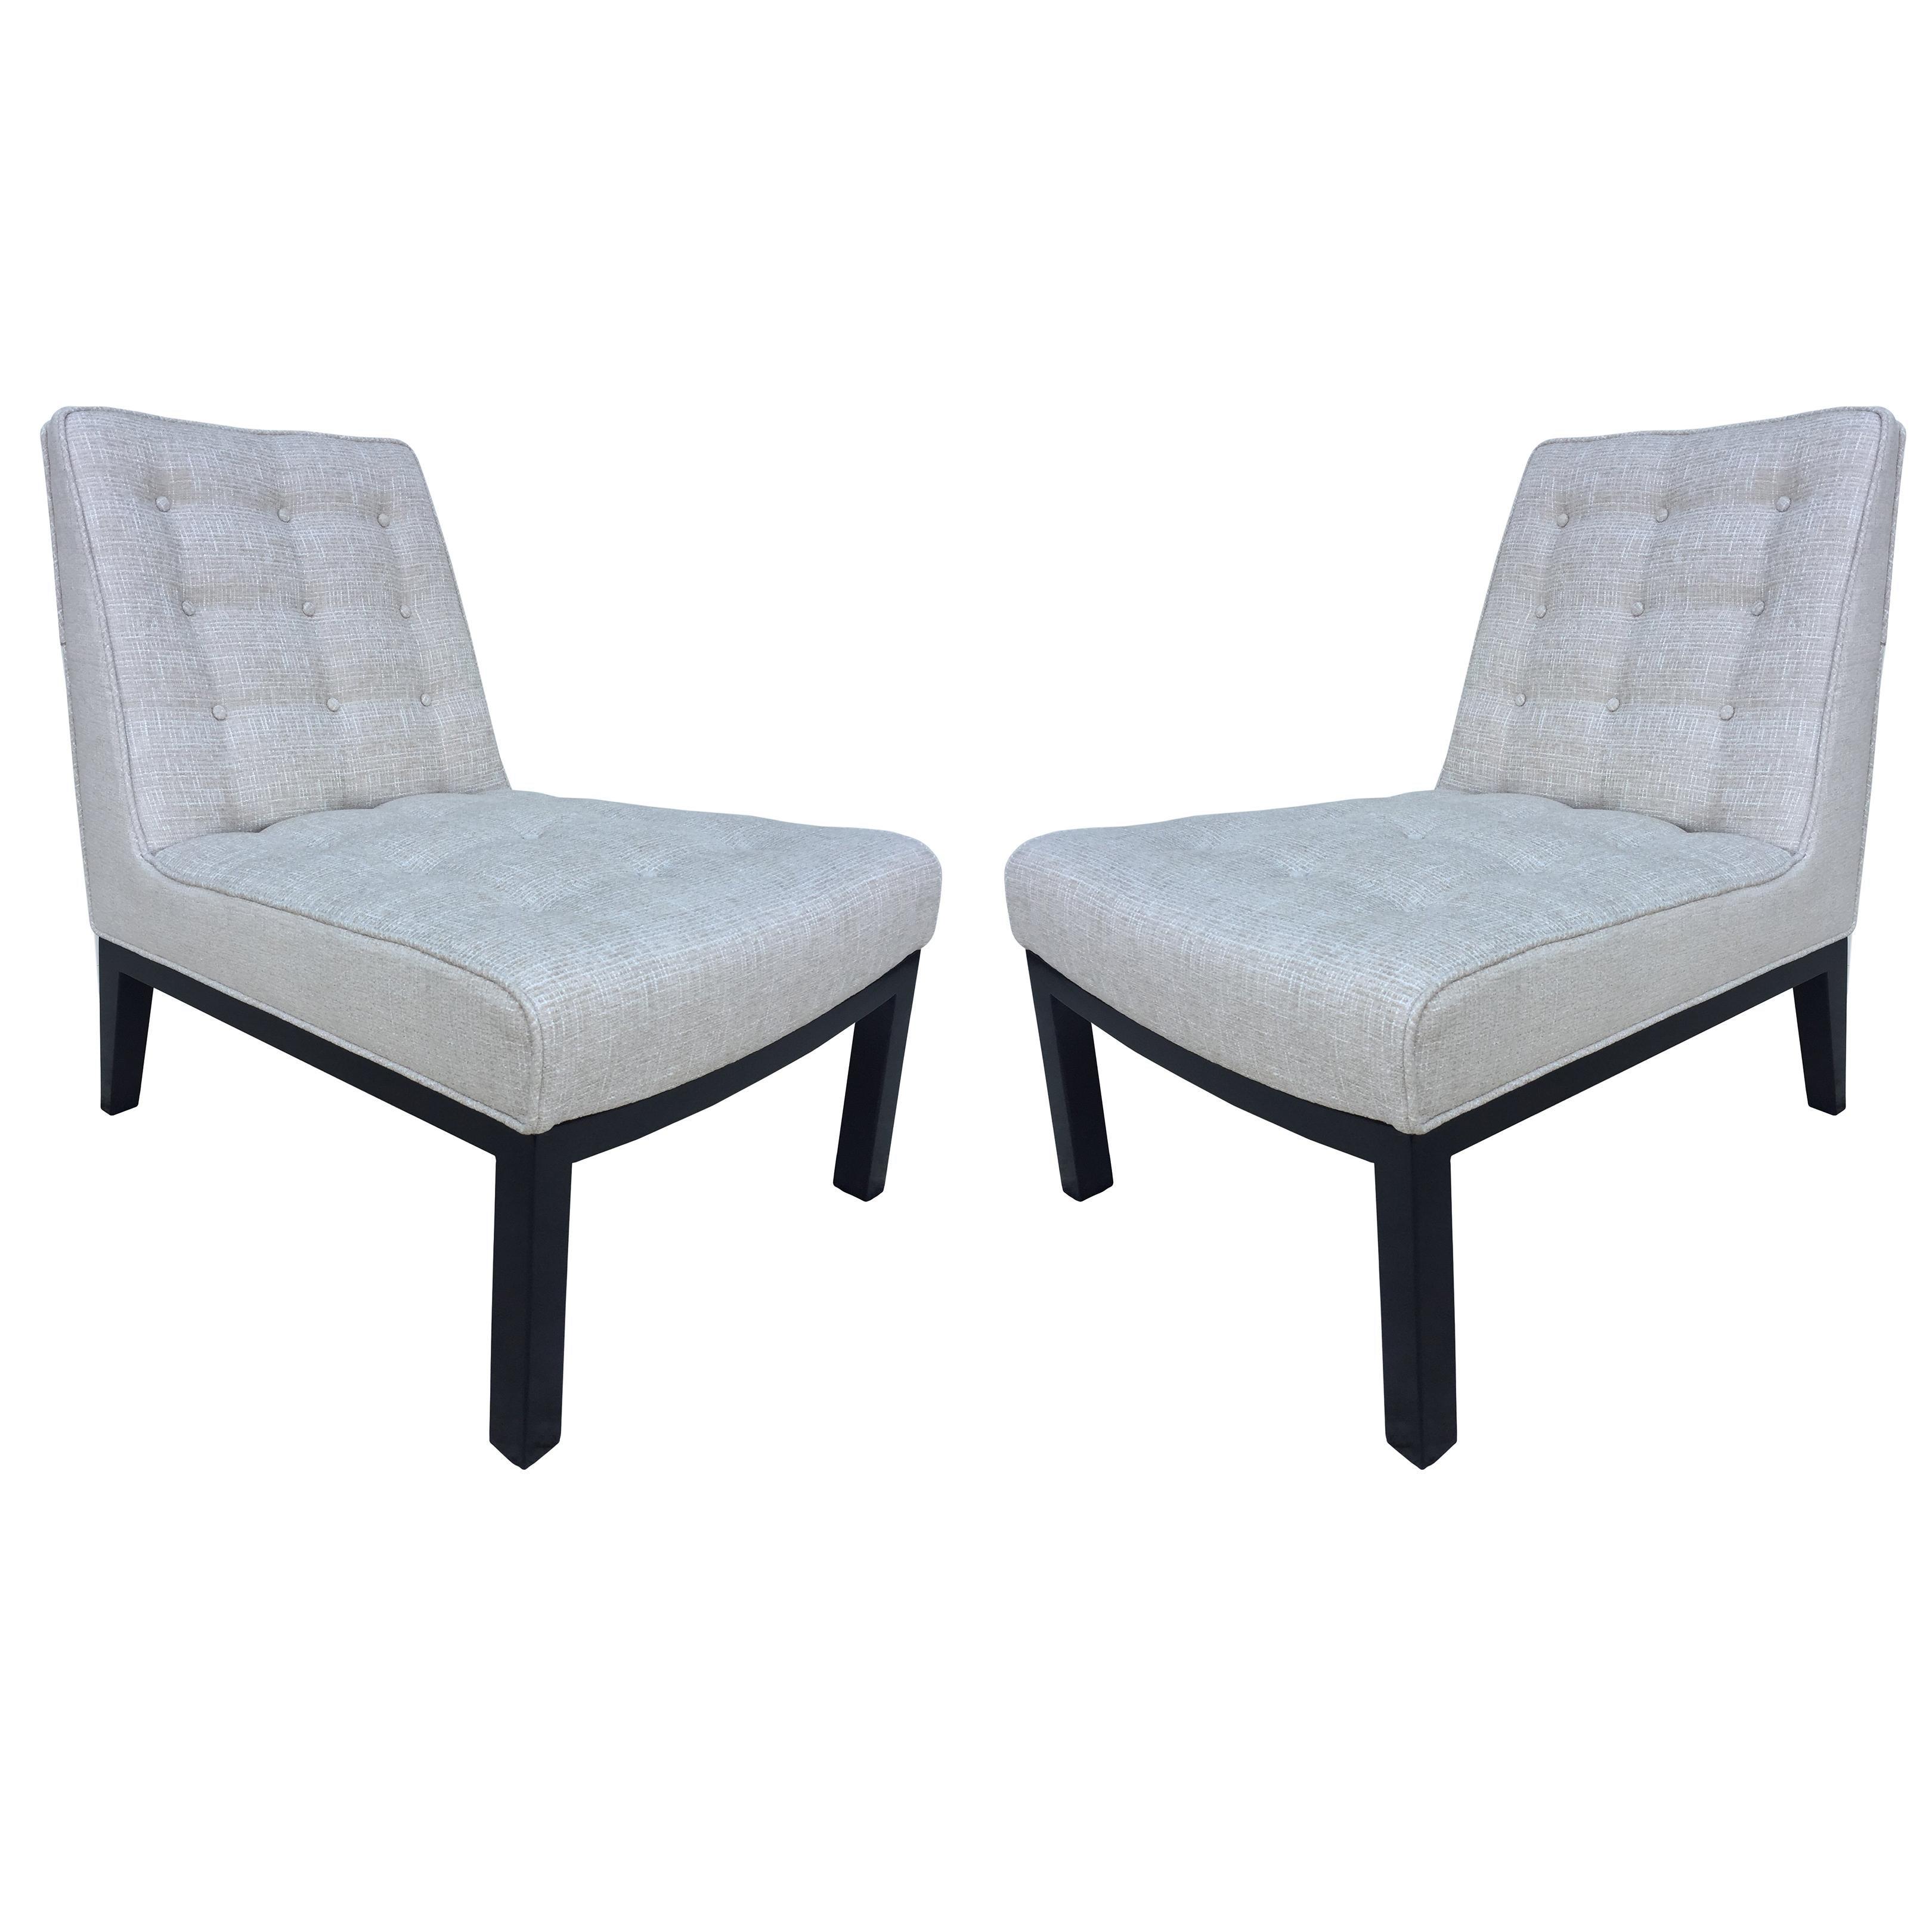 Pair of Dunbar Edward Wormley Slipper Chairs